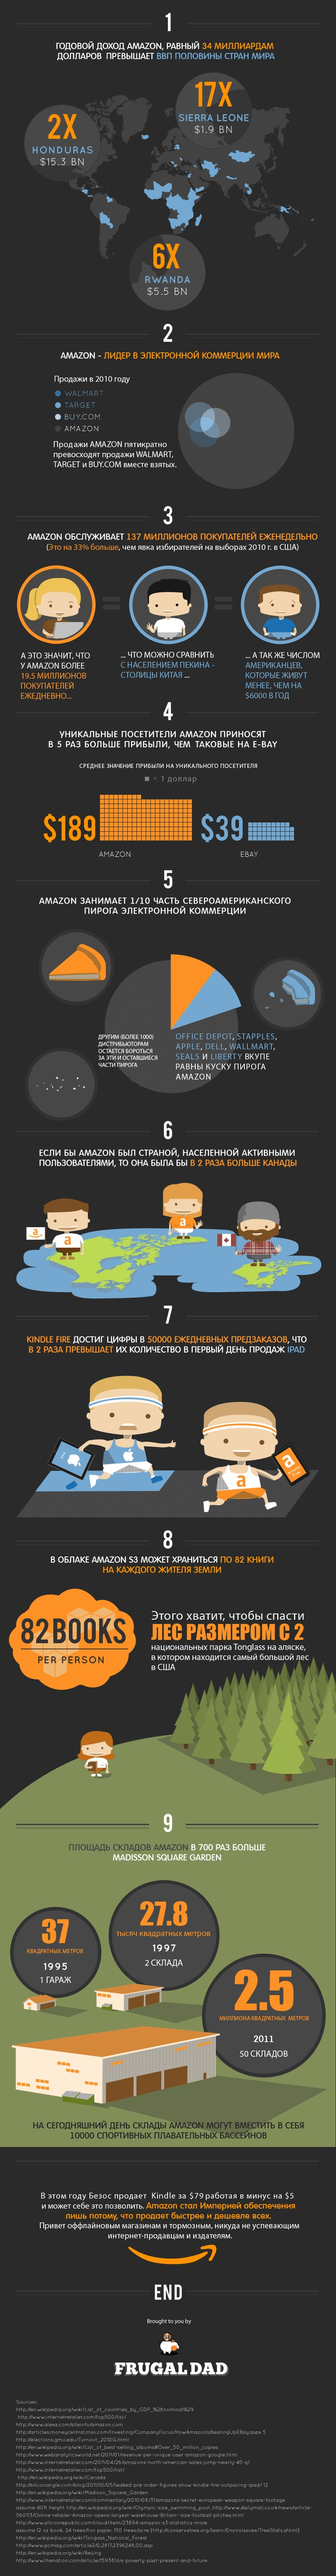 9 фактов об Amazon в отличной обёртке. StartUp Школа